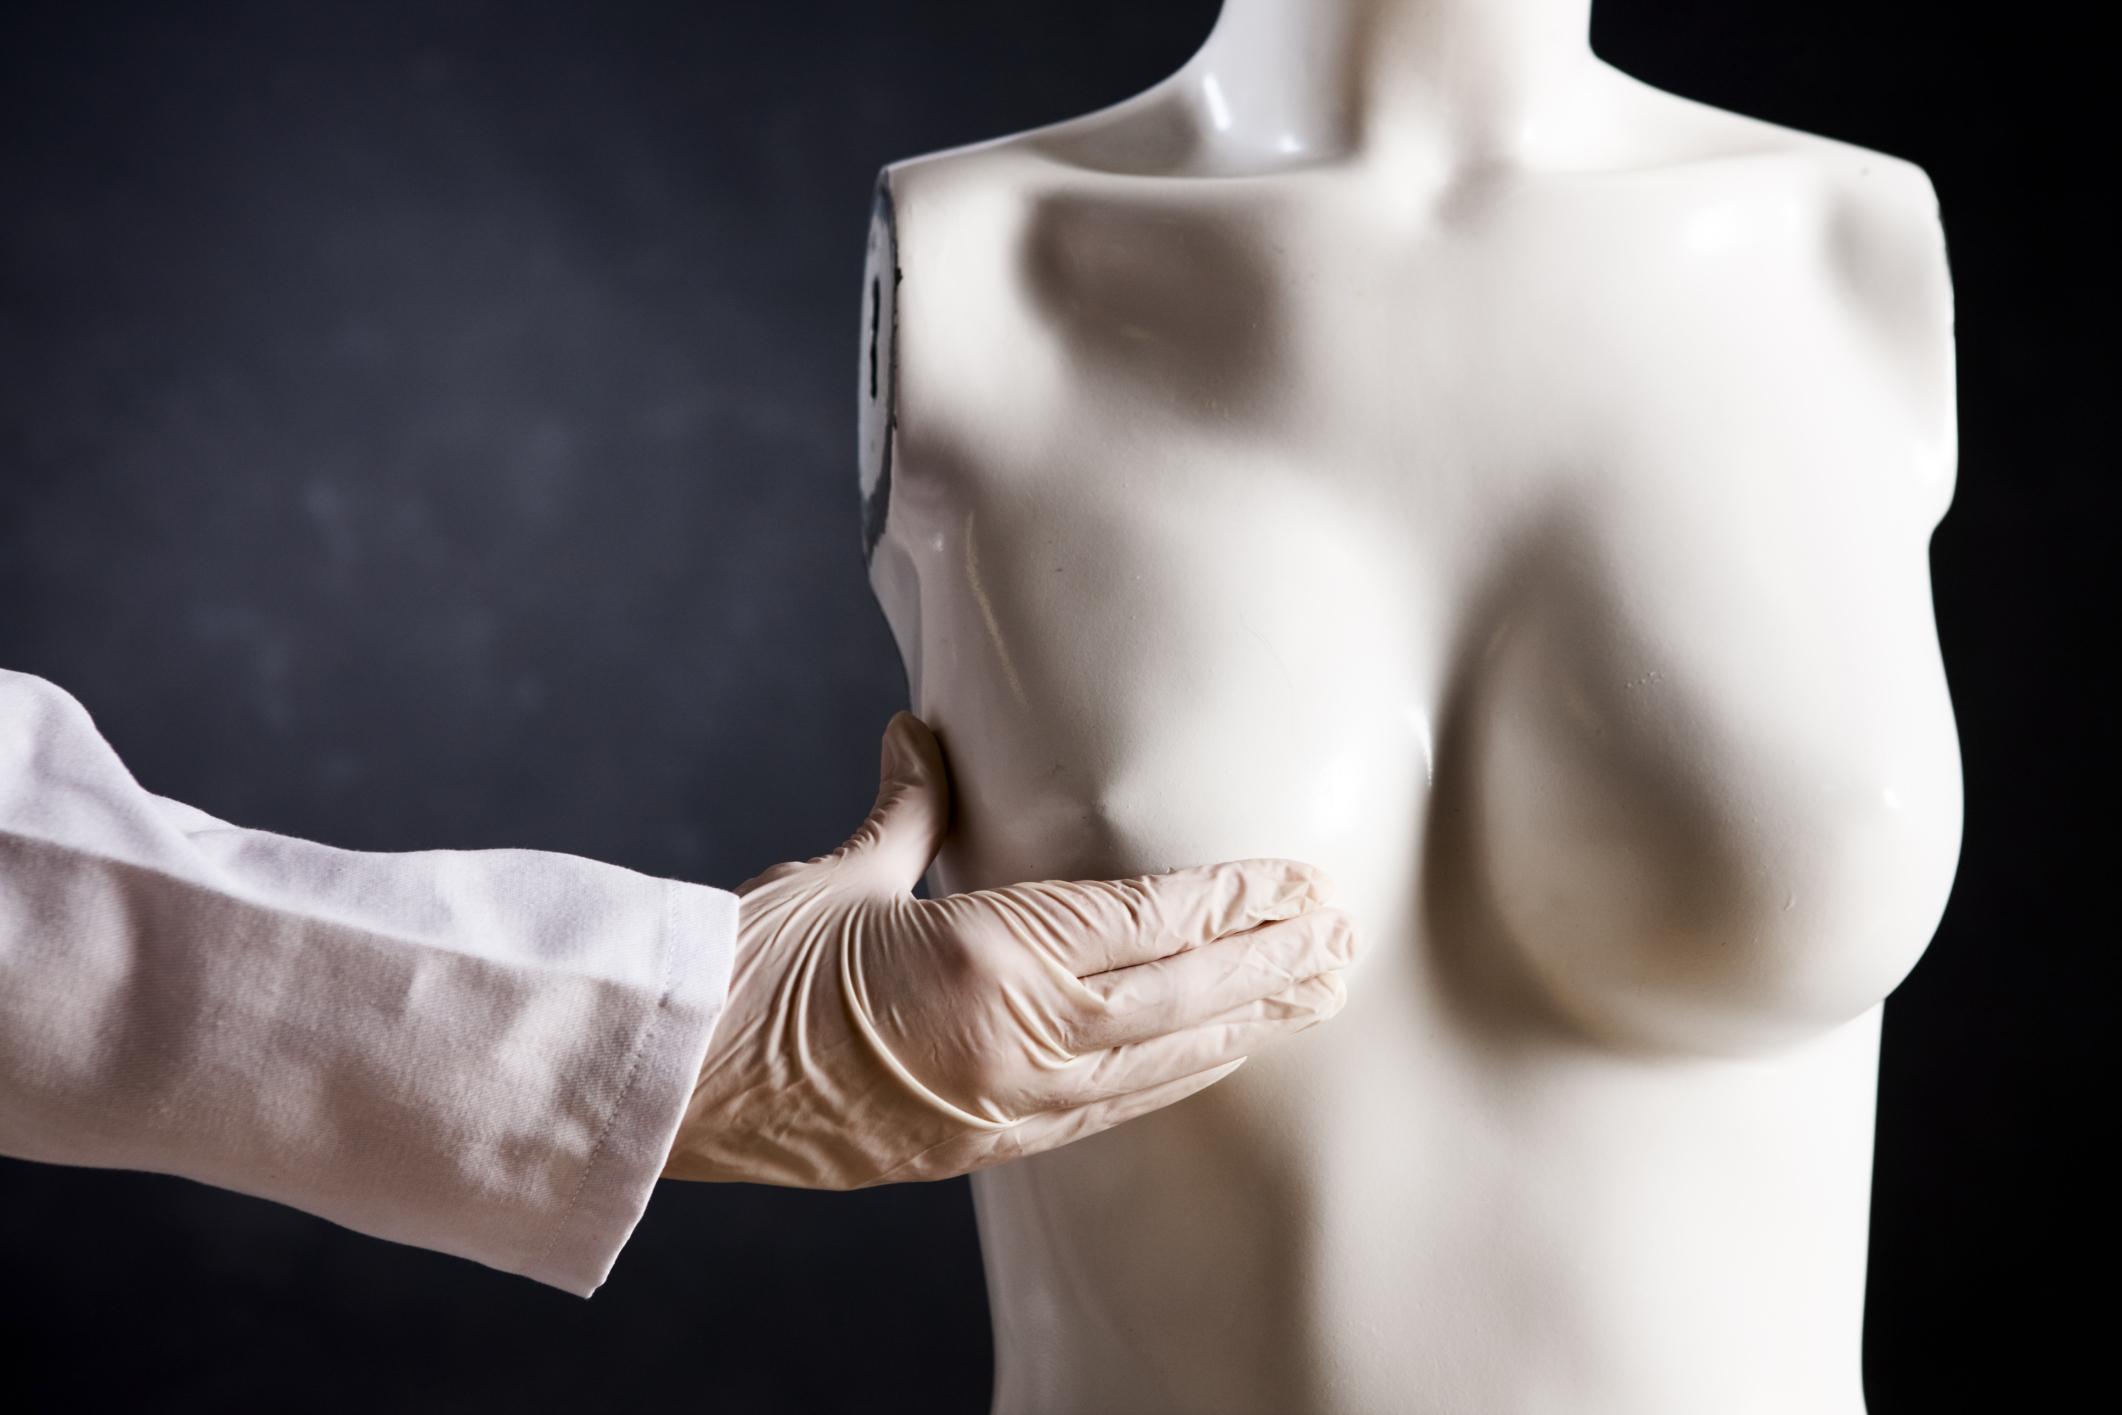 Рак молочной железы: разновидности и признаки